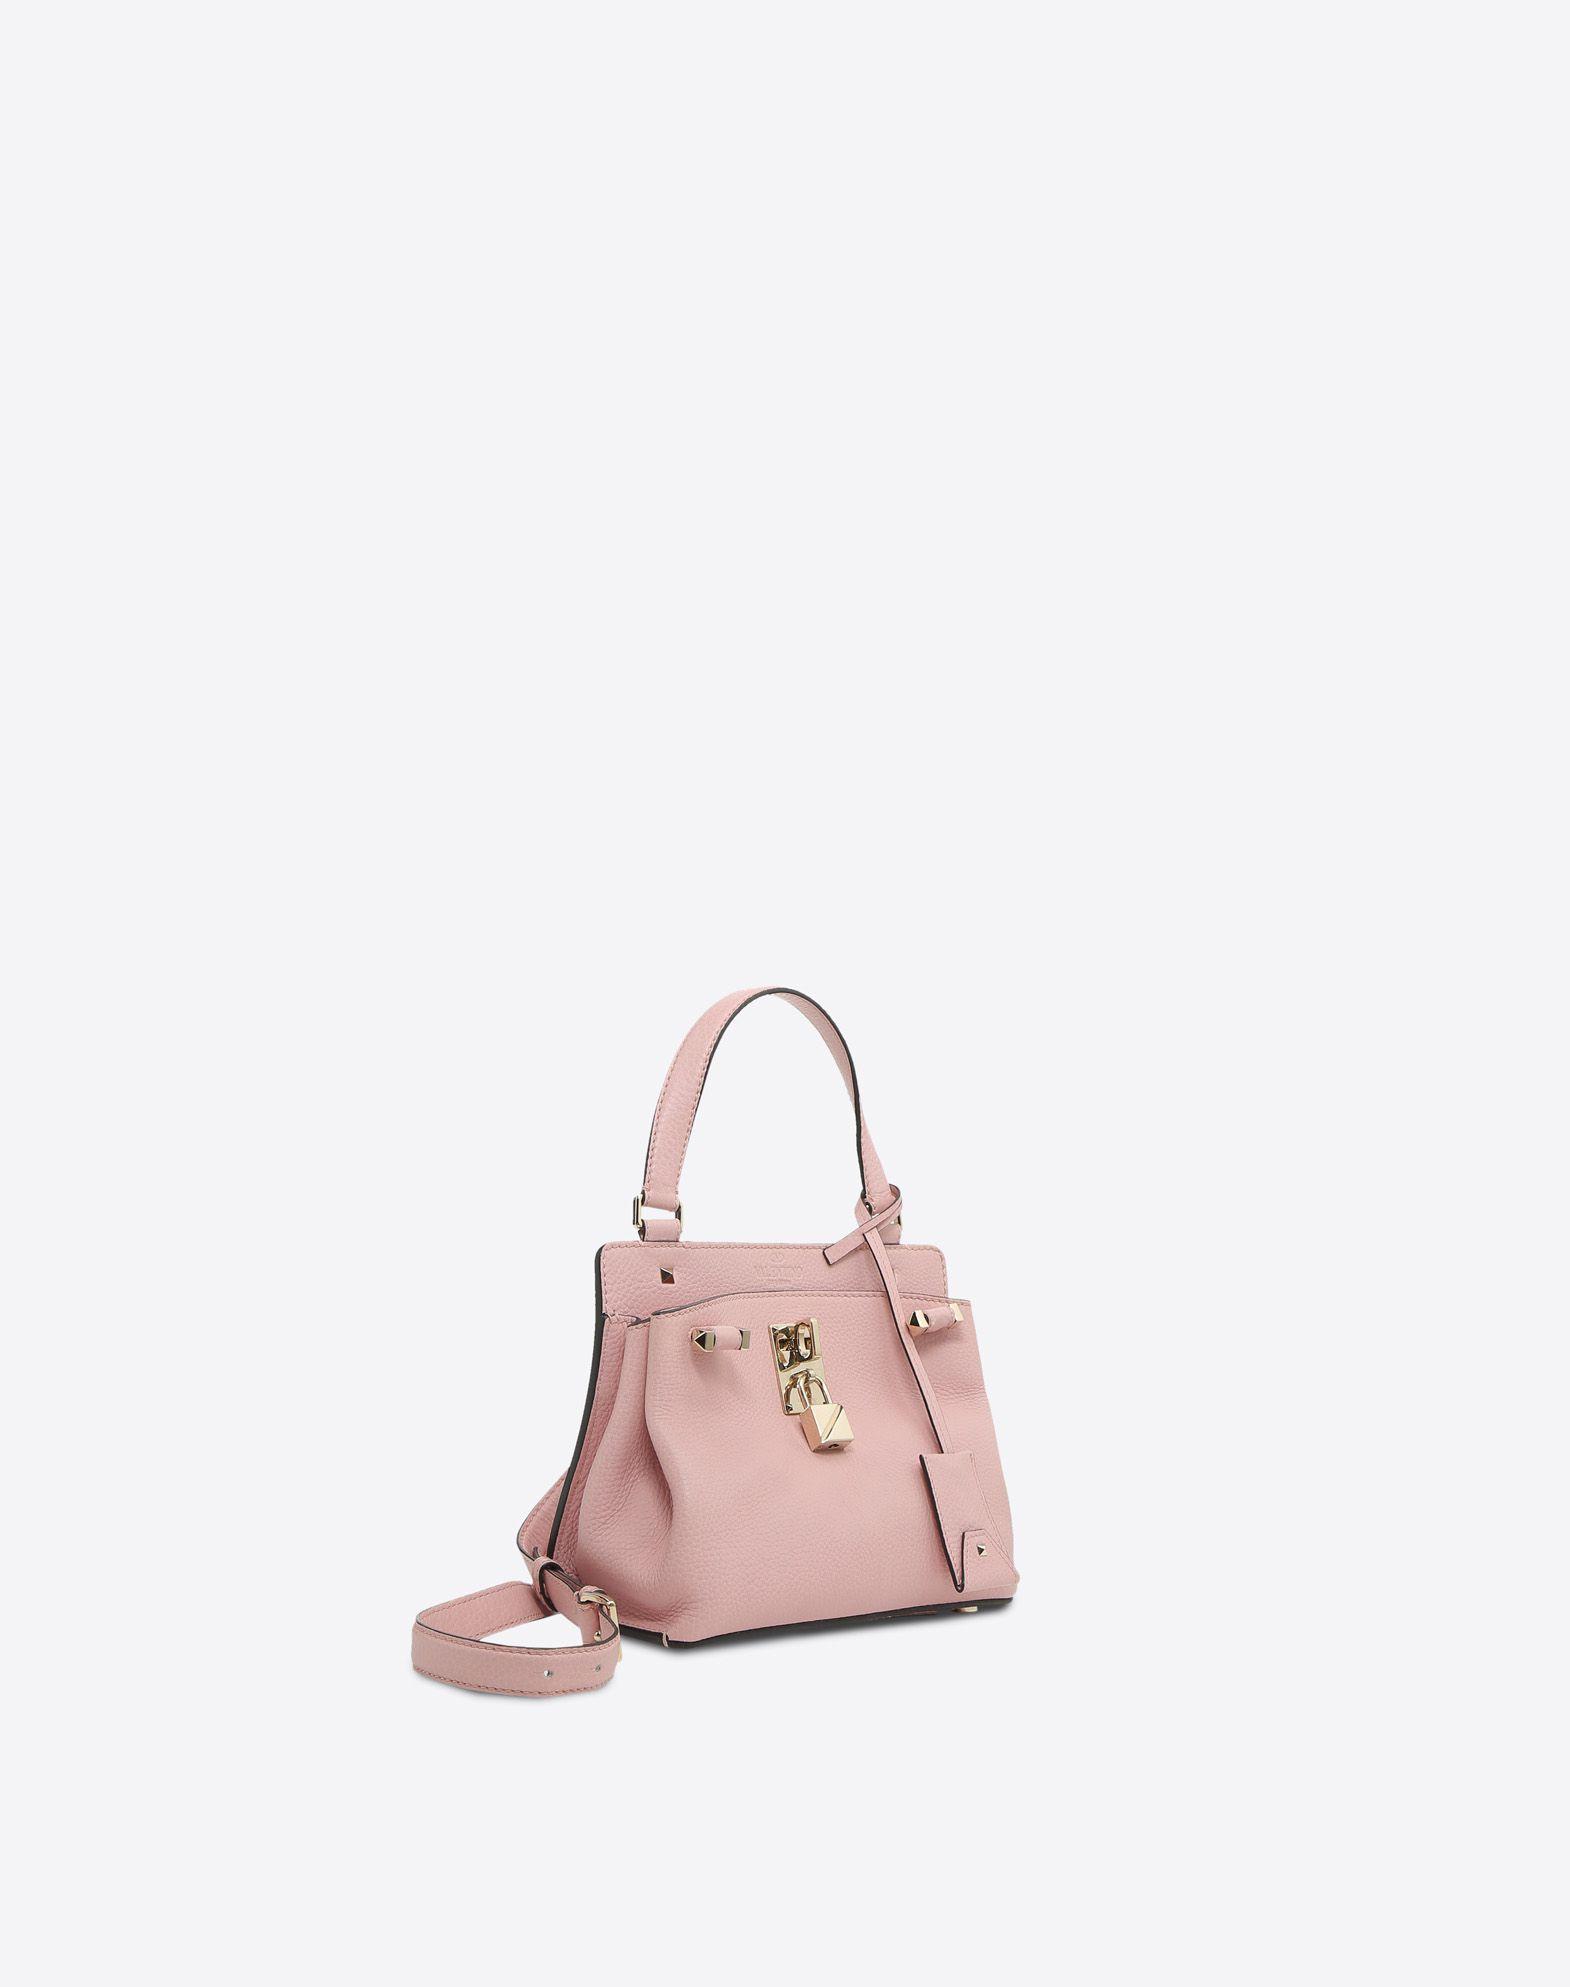 VALENTINO GARAVANI Joylock Small Handle Bag HANDBAG D r